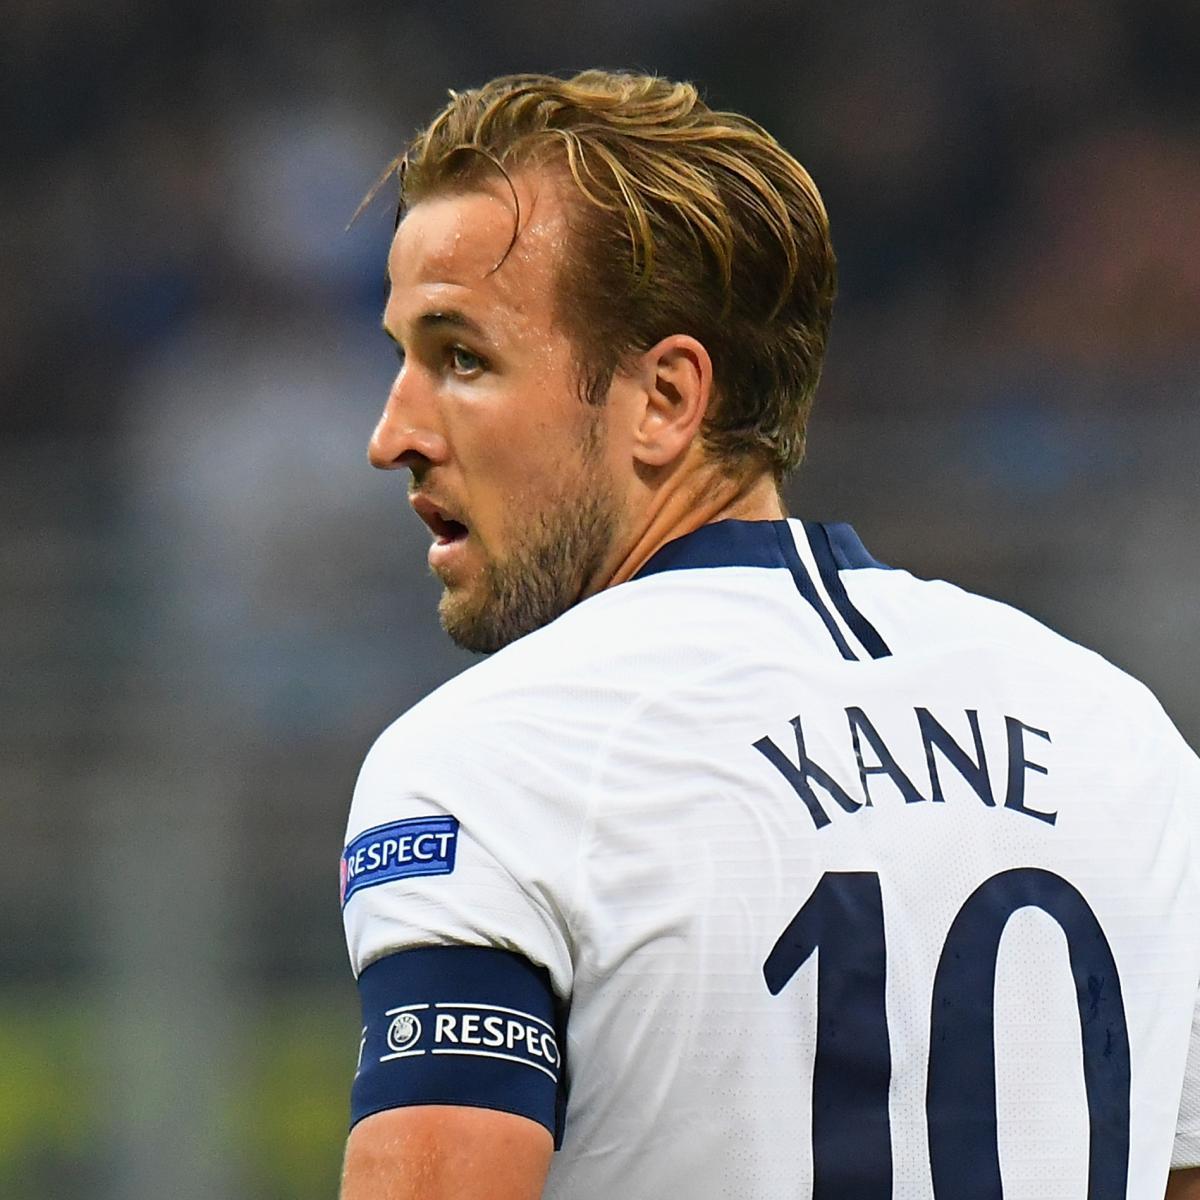 Lucas Moura Tottenham Highlights: Erik Lamela Backs Harry Kane After Champions League Loss